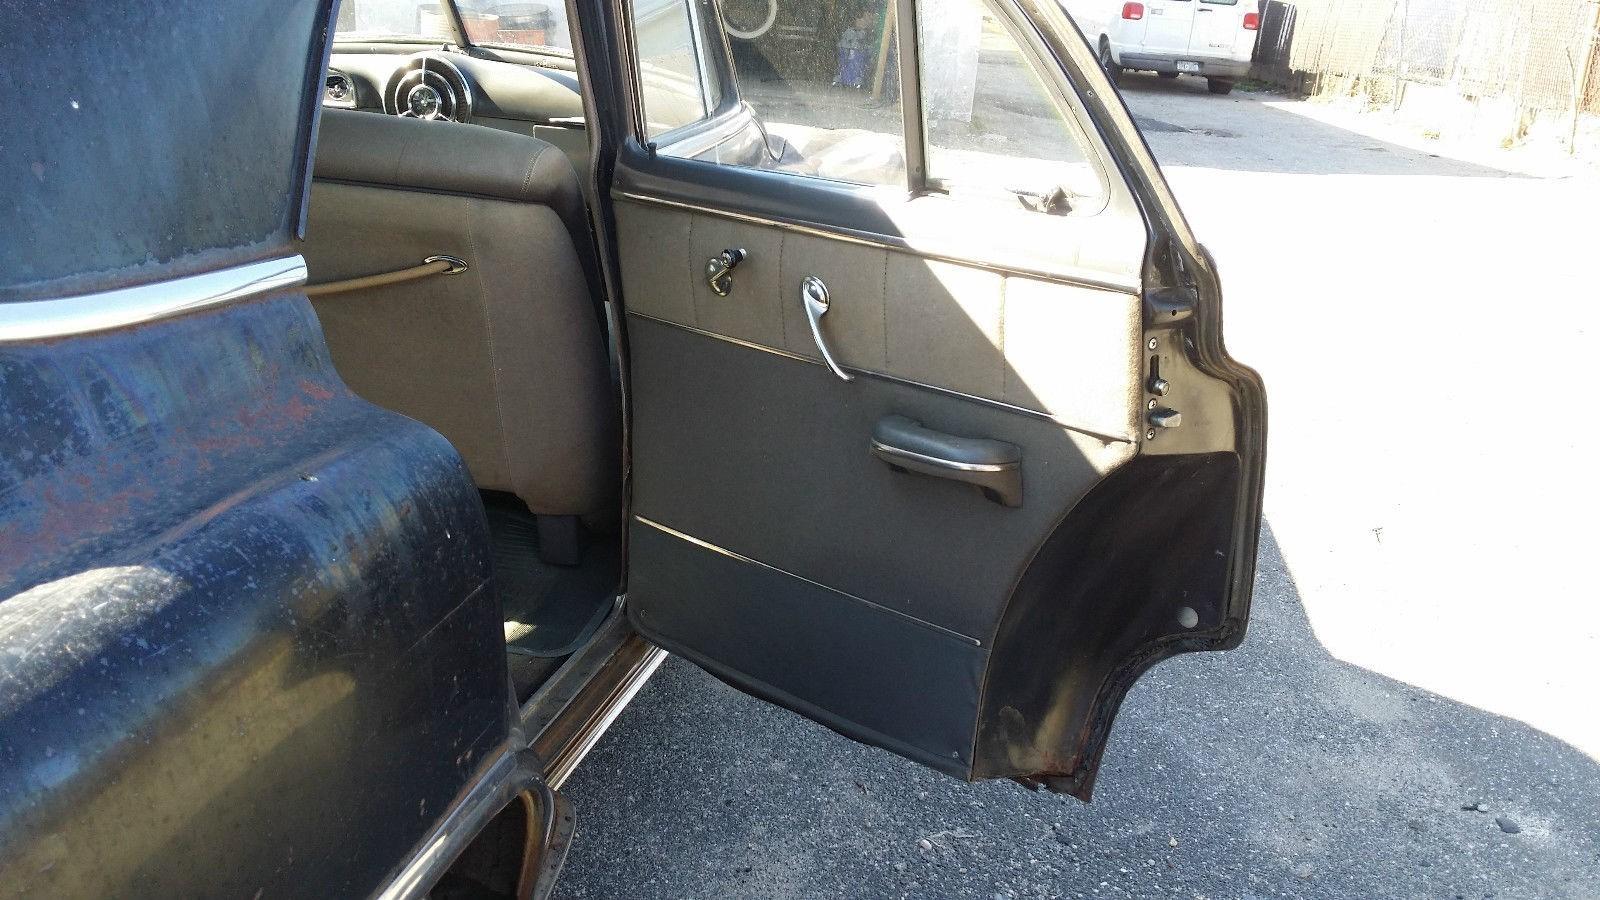 1950 Pontiac Chieftain Eight Deluxe Sedan (25)